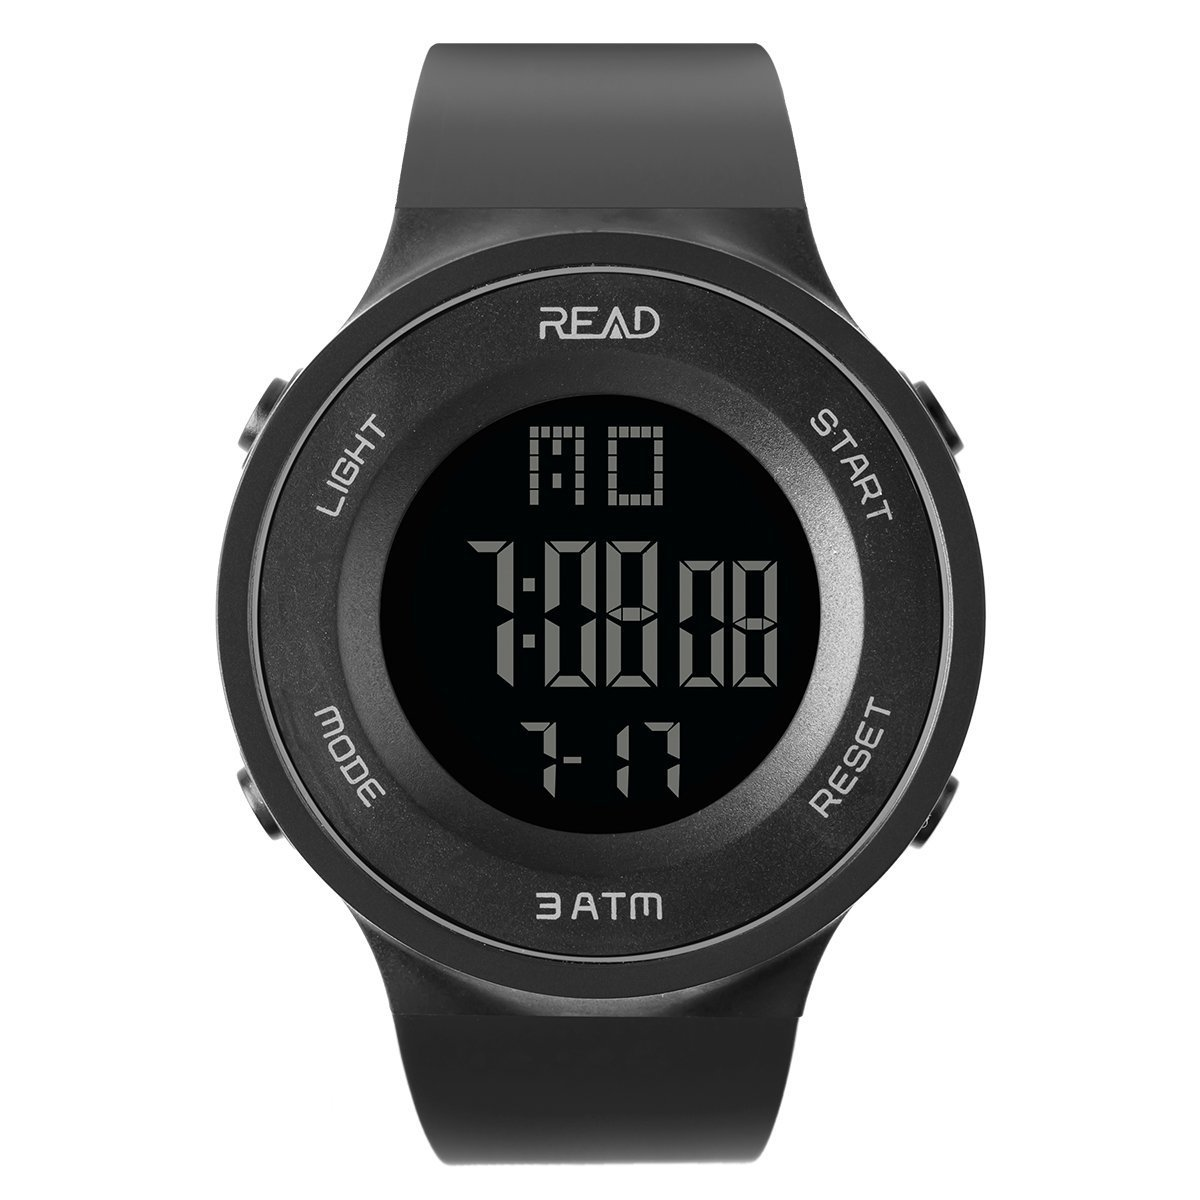 TEZER Digital Watch Outdoor Electronic Ultra Thin LED Large Face Military Light Black Stopwatch Alarm Men's Wristwatch 90003 (Black)